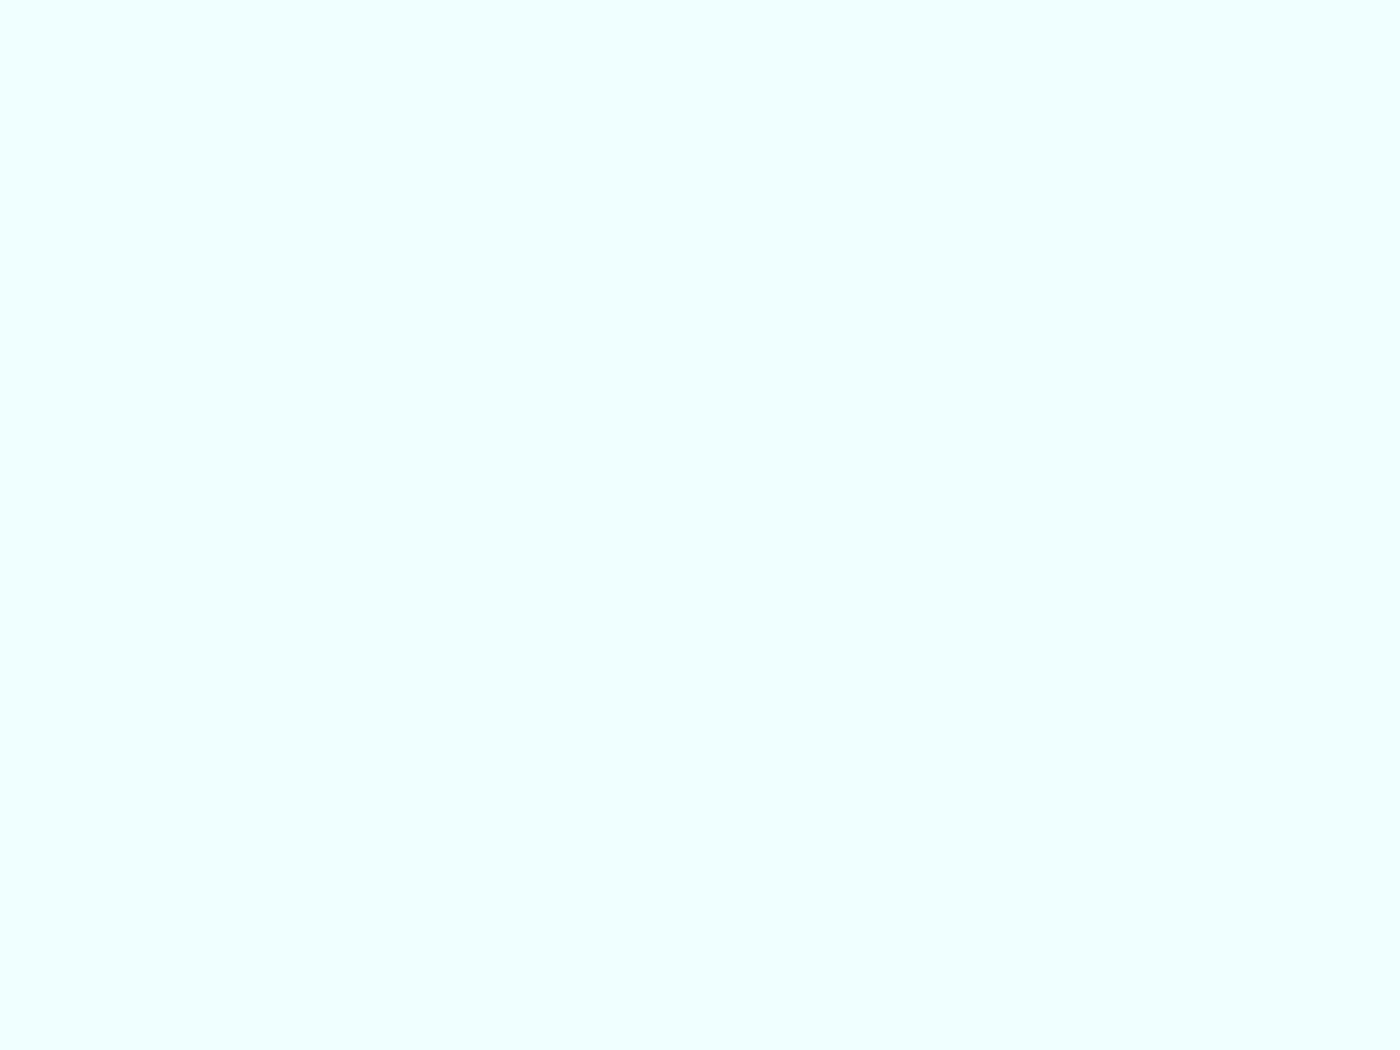 1400x1050 Azure Mist Solid Color Background